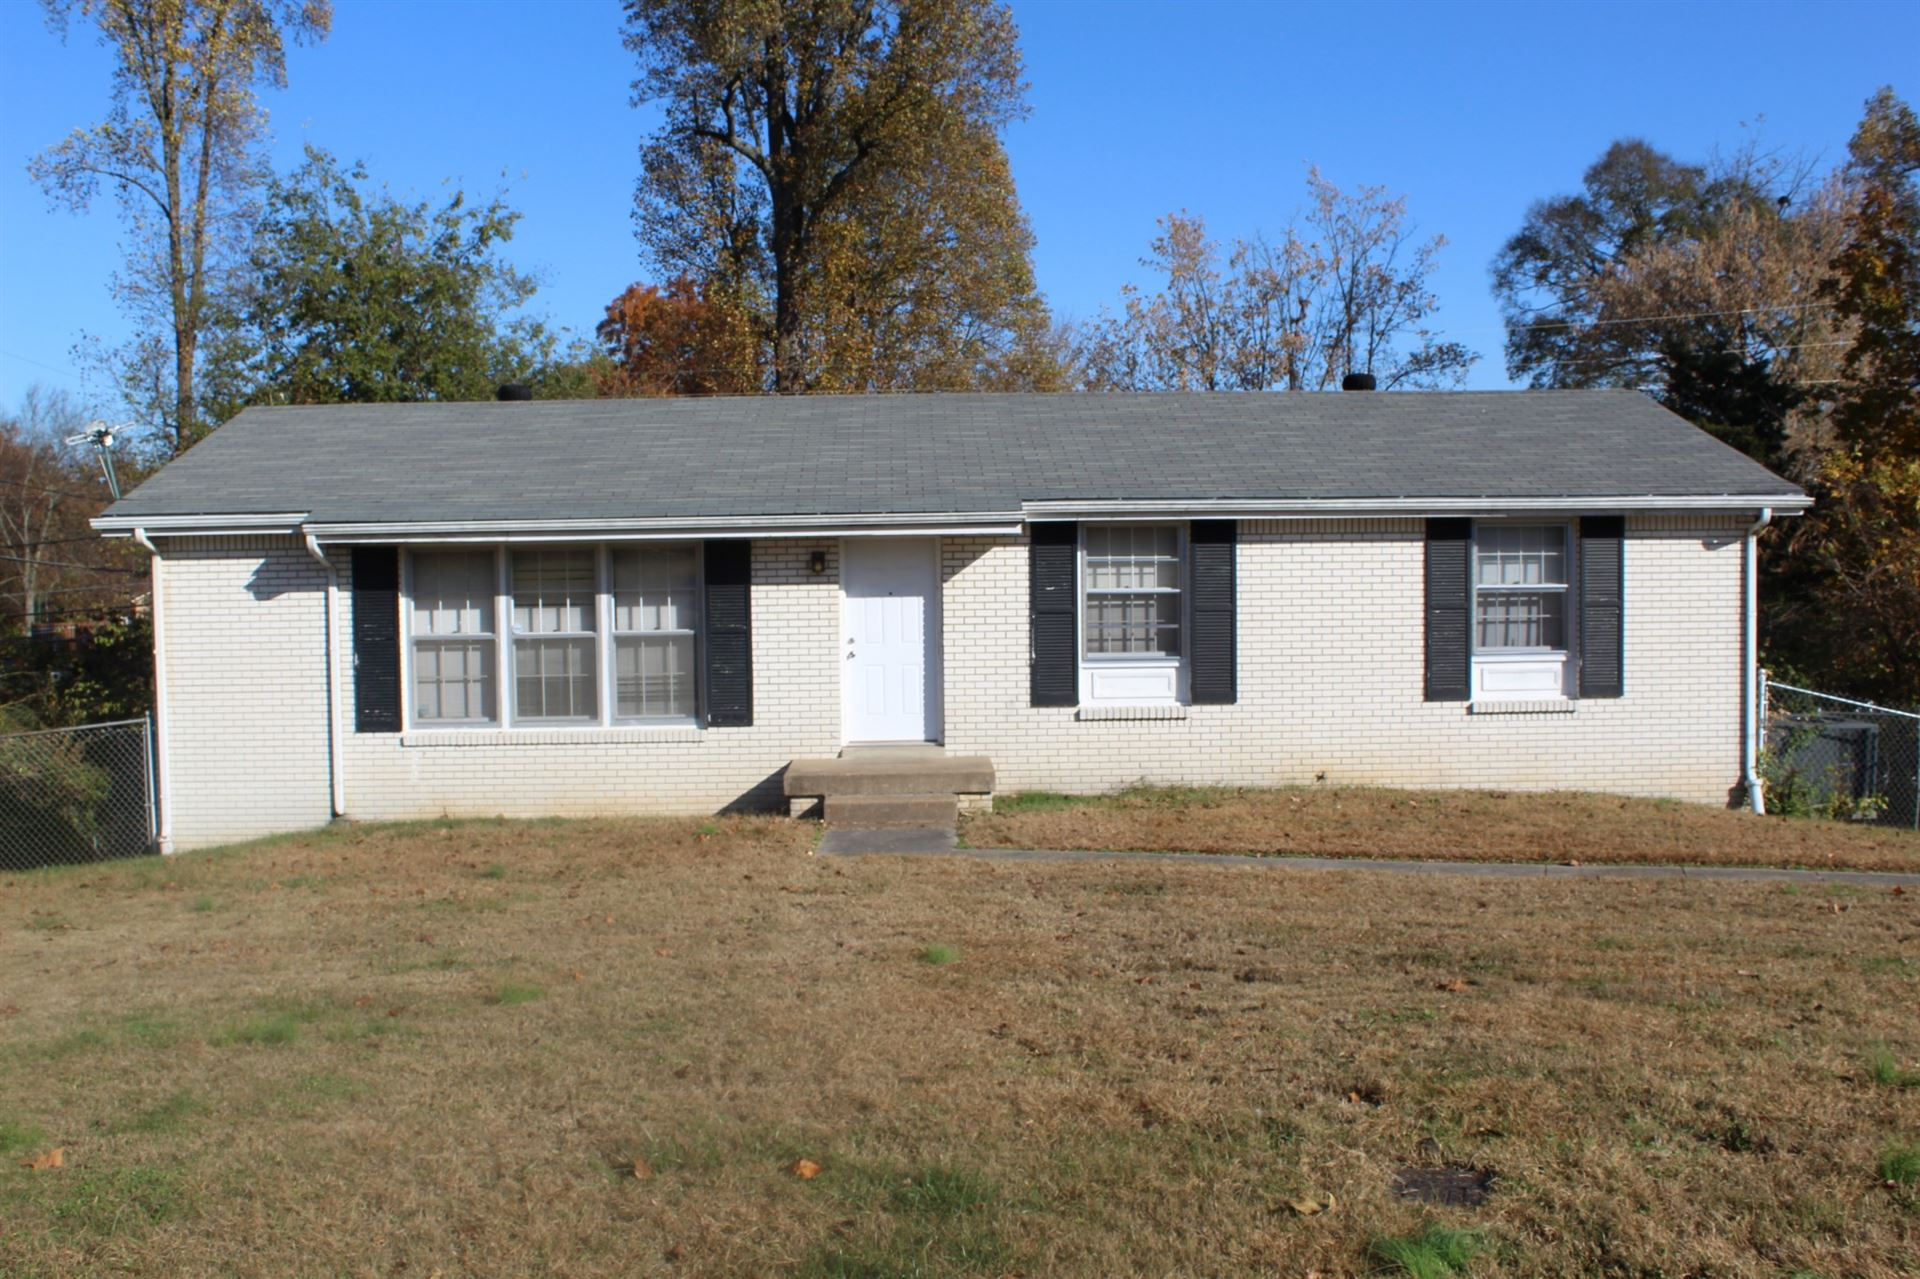 205 Mills Dr, Clarksville, TN 37042 - MLS#: 2206571